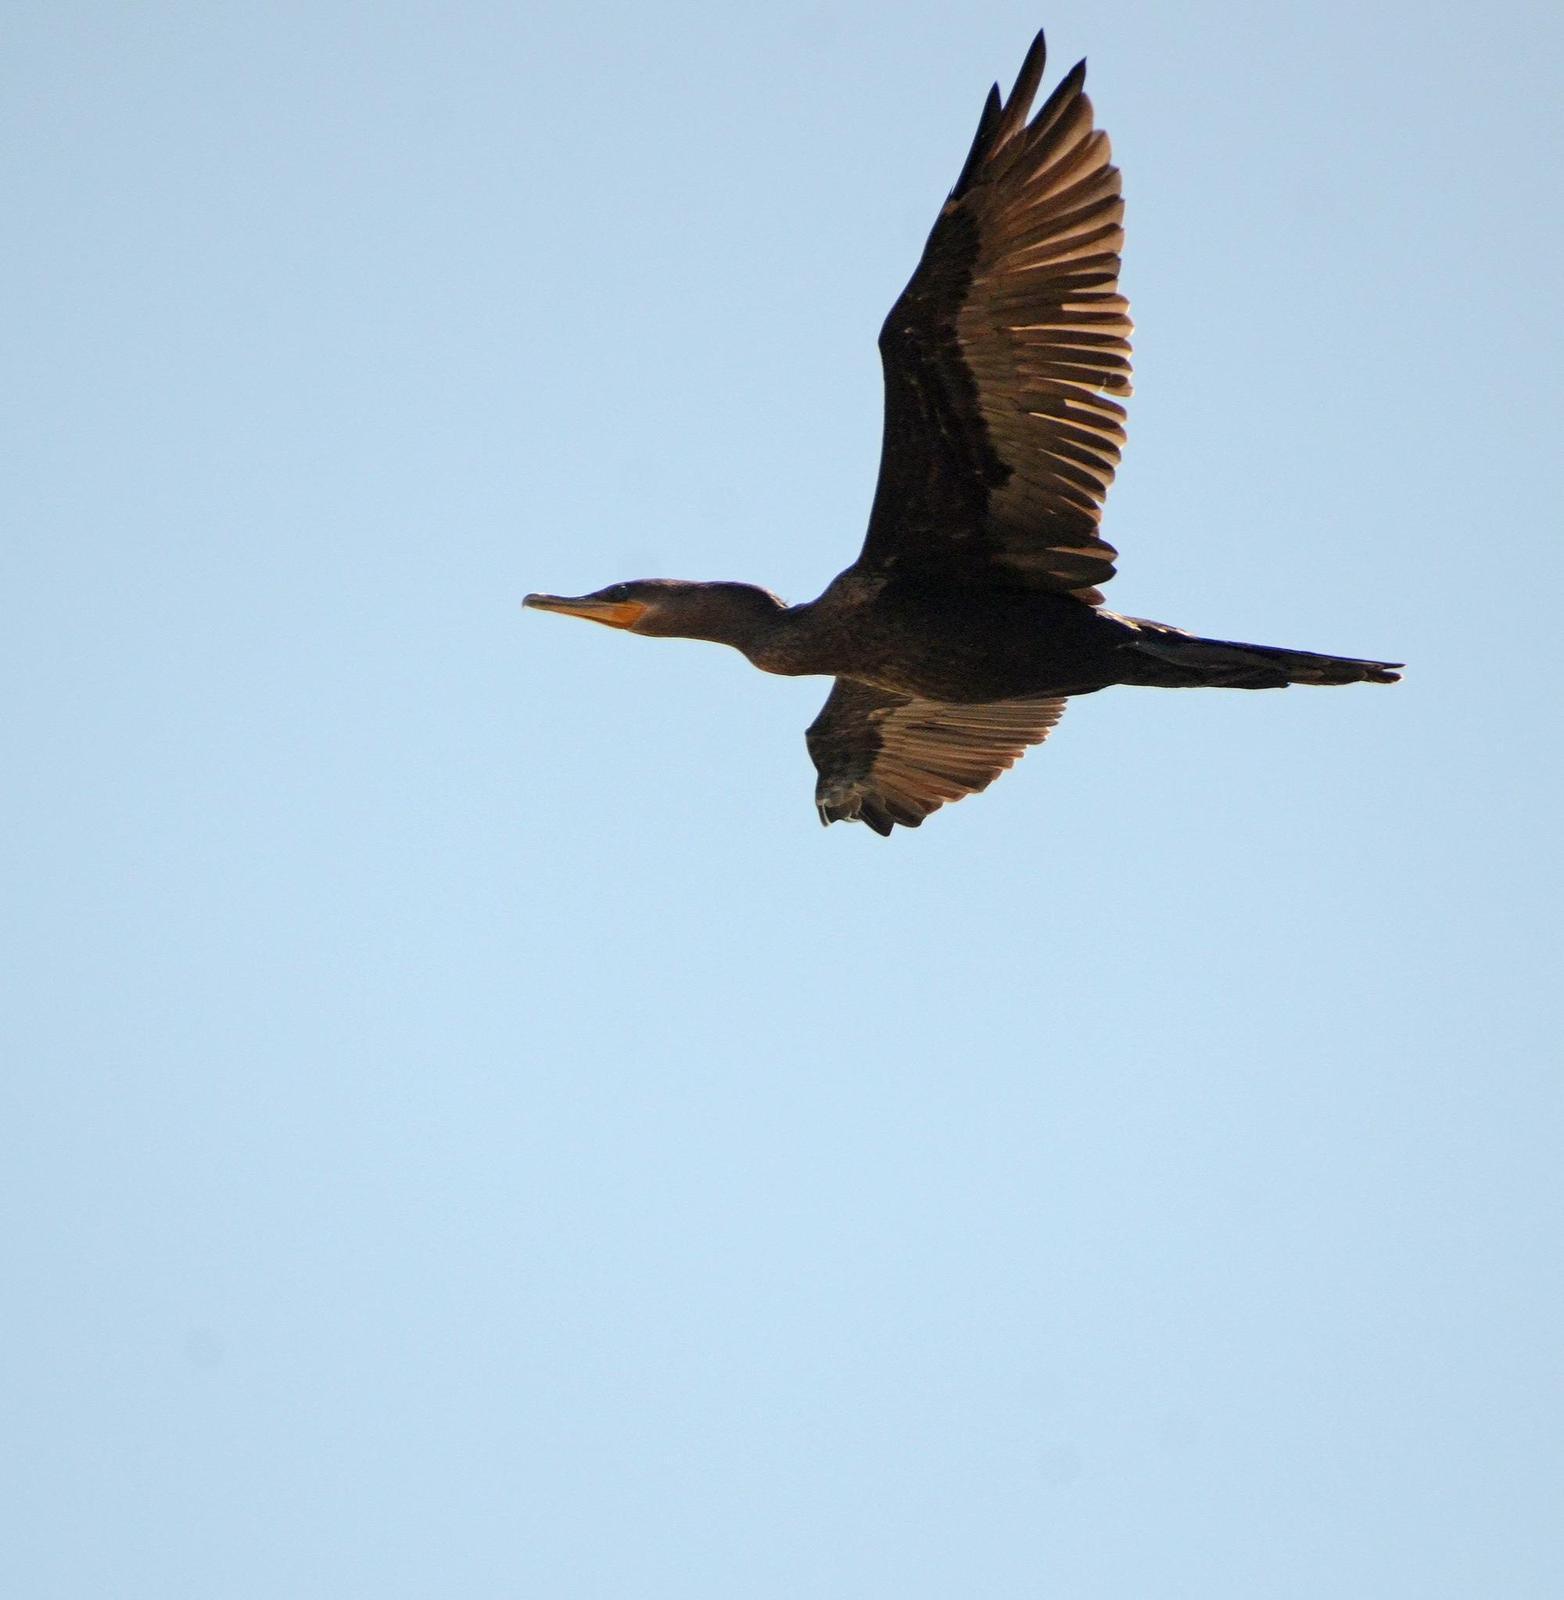 Neotropic Cormorant Photo by Steven Mlodinow